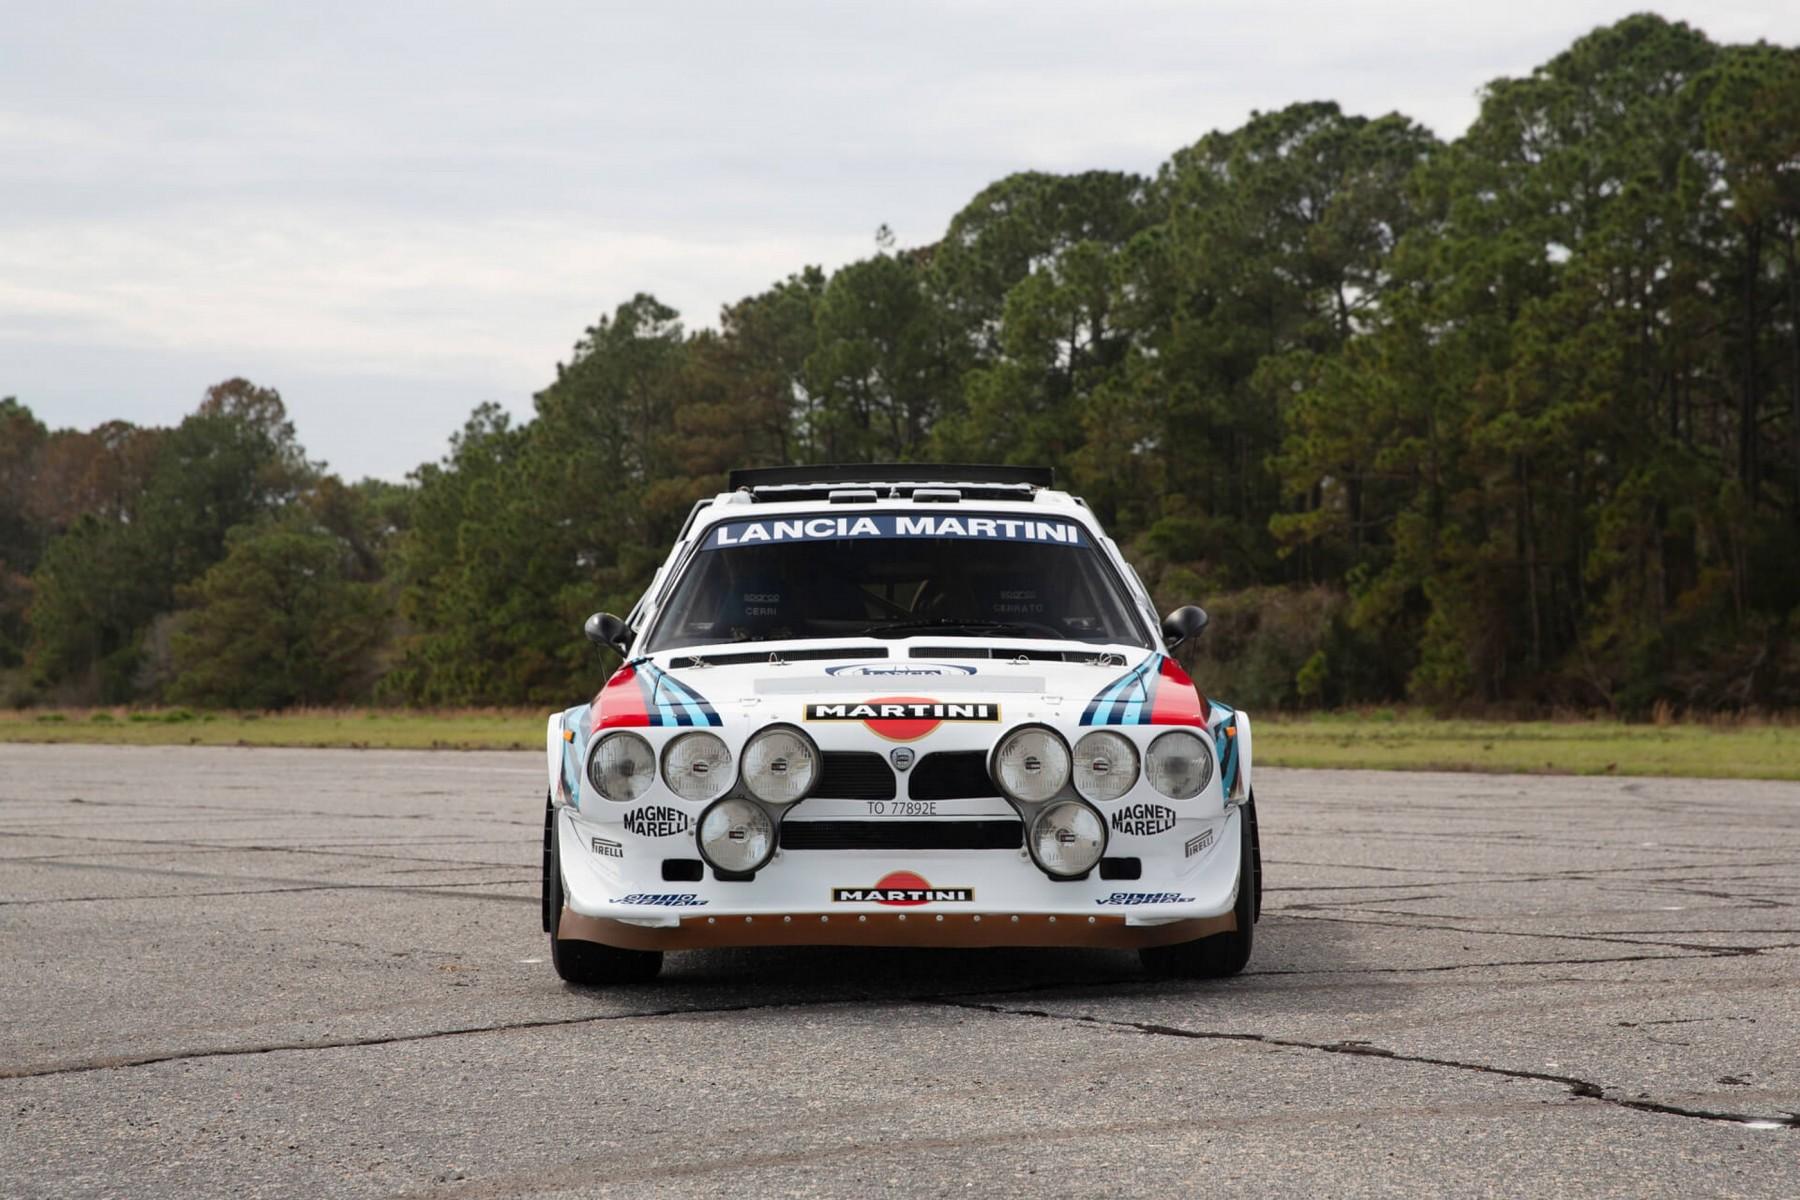 Lancia Delsta S4 Corsa Gruppo B